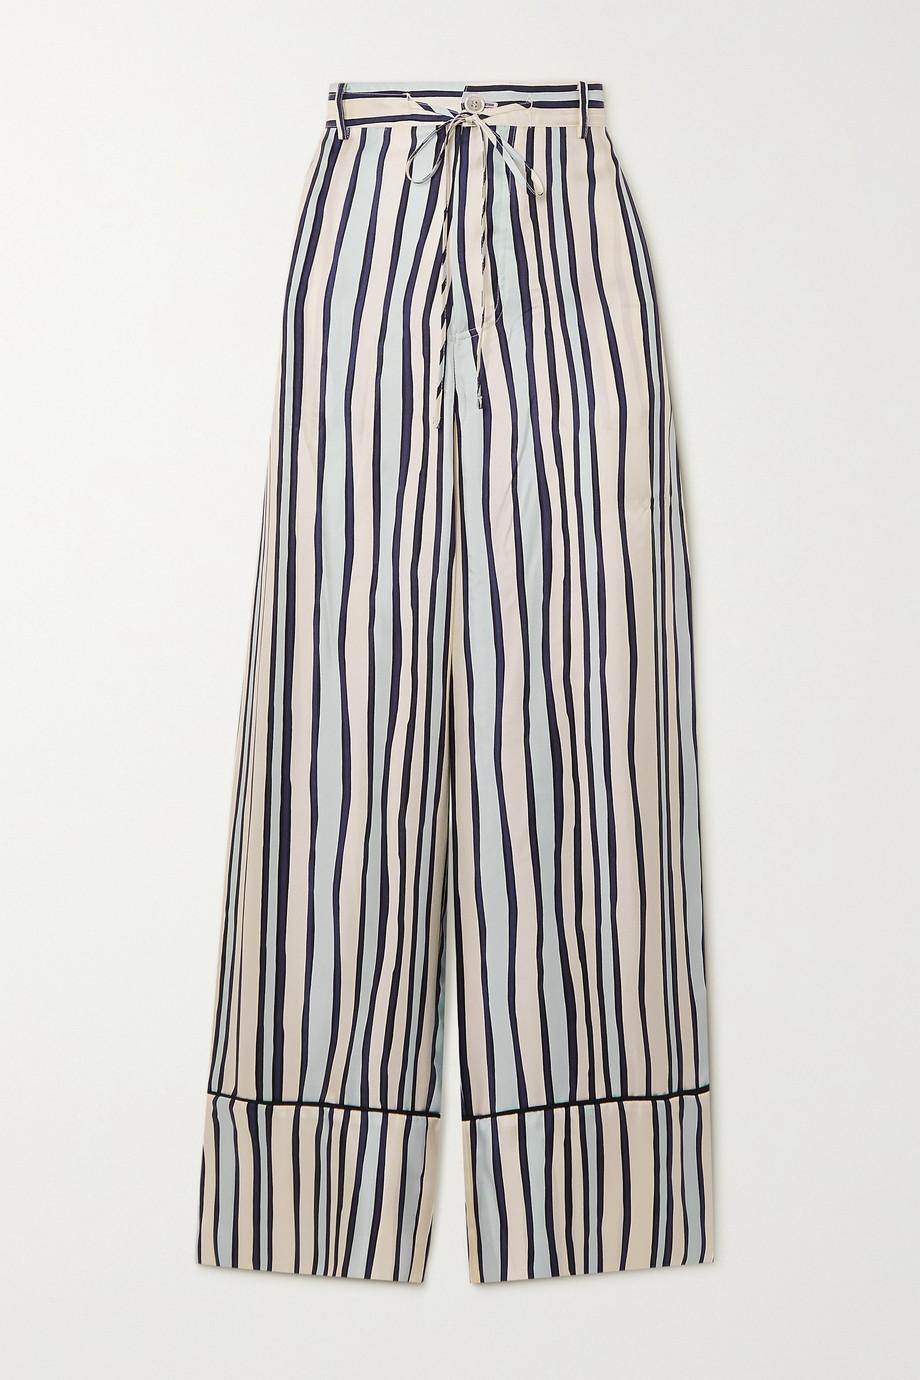 Marni Pantalon en serge de soie à rayures